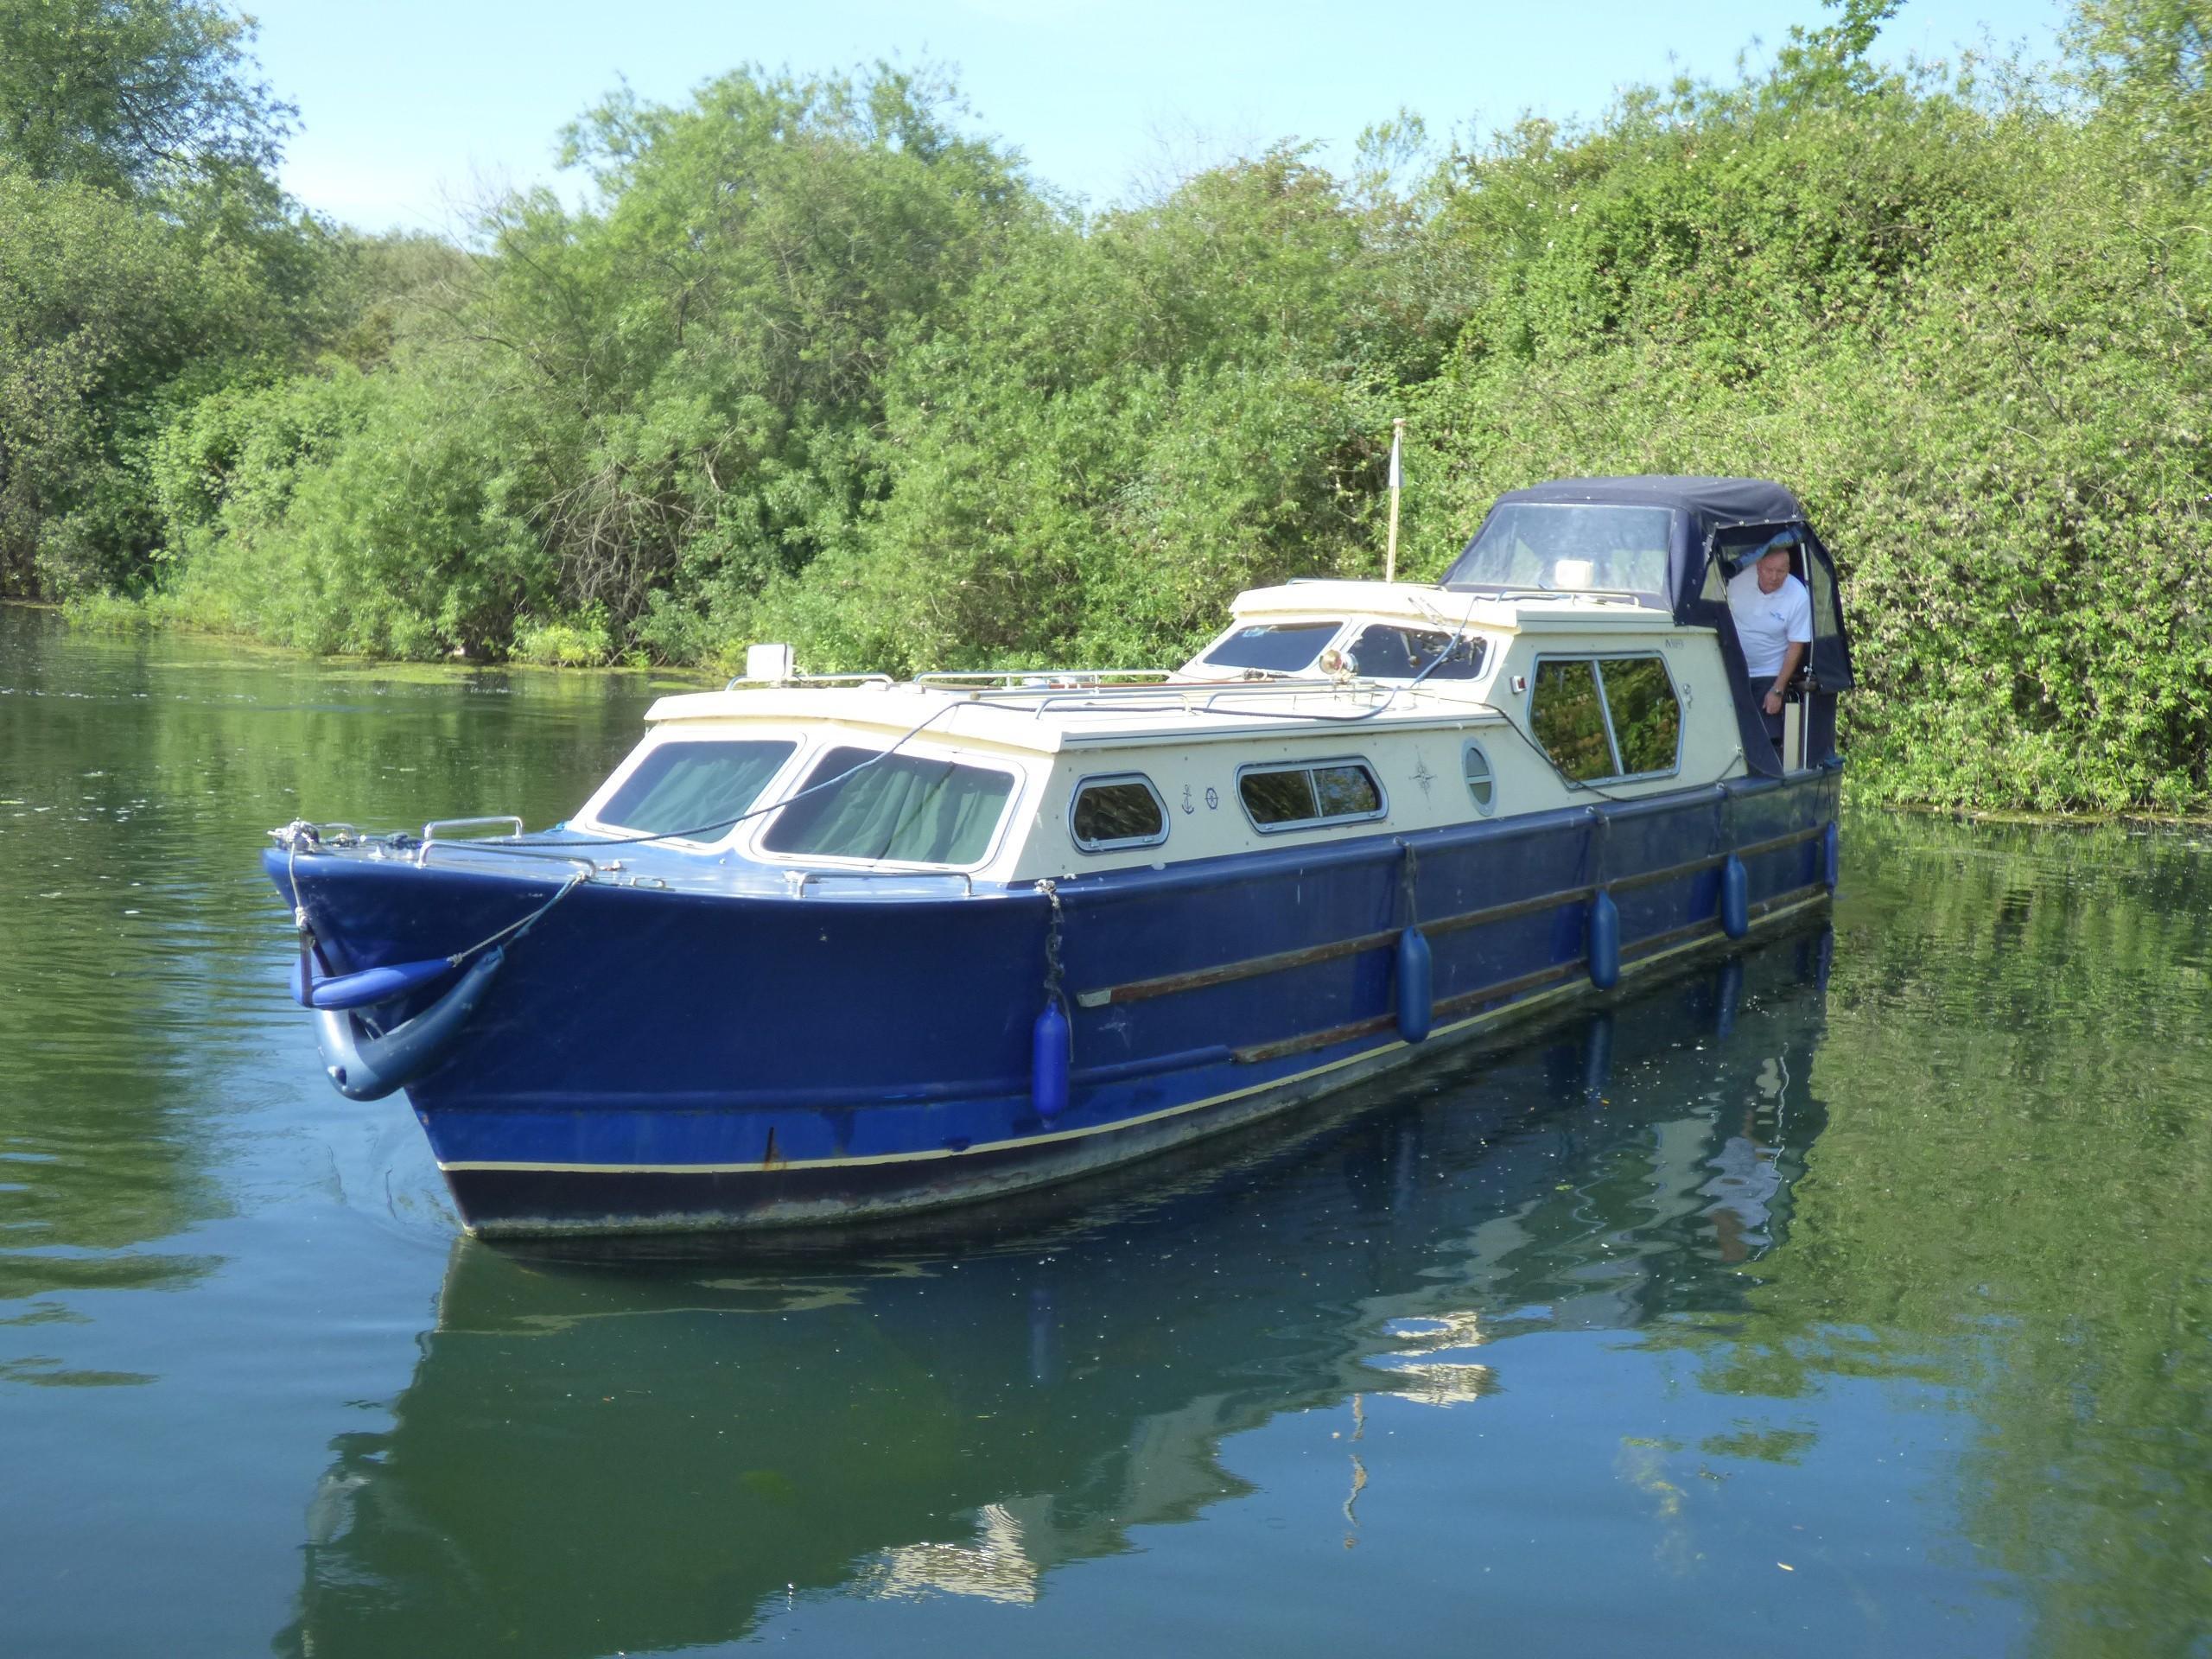 Narrowboat Suncruiser 36 built by Paul Steed